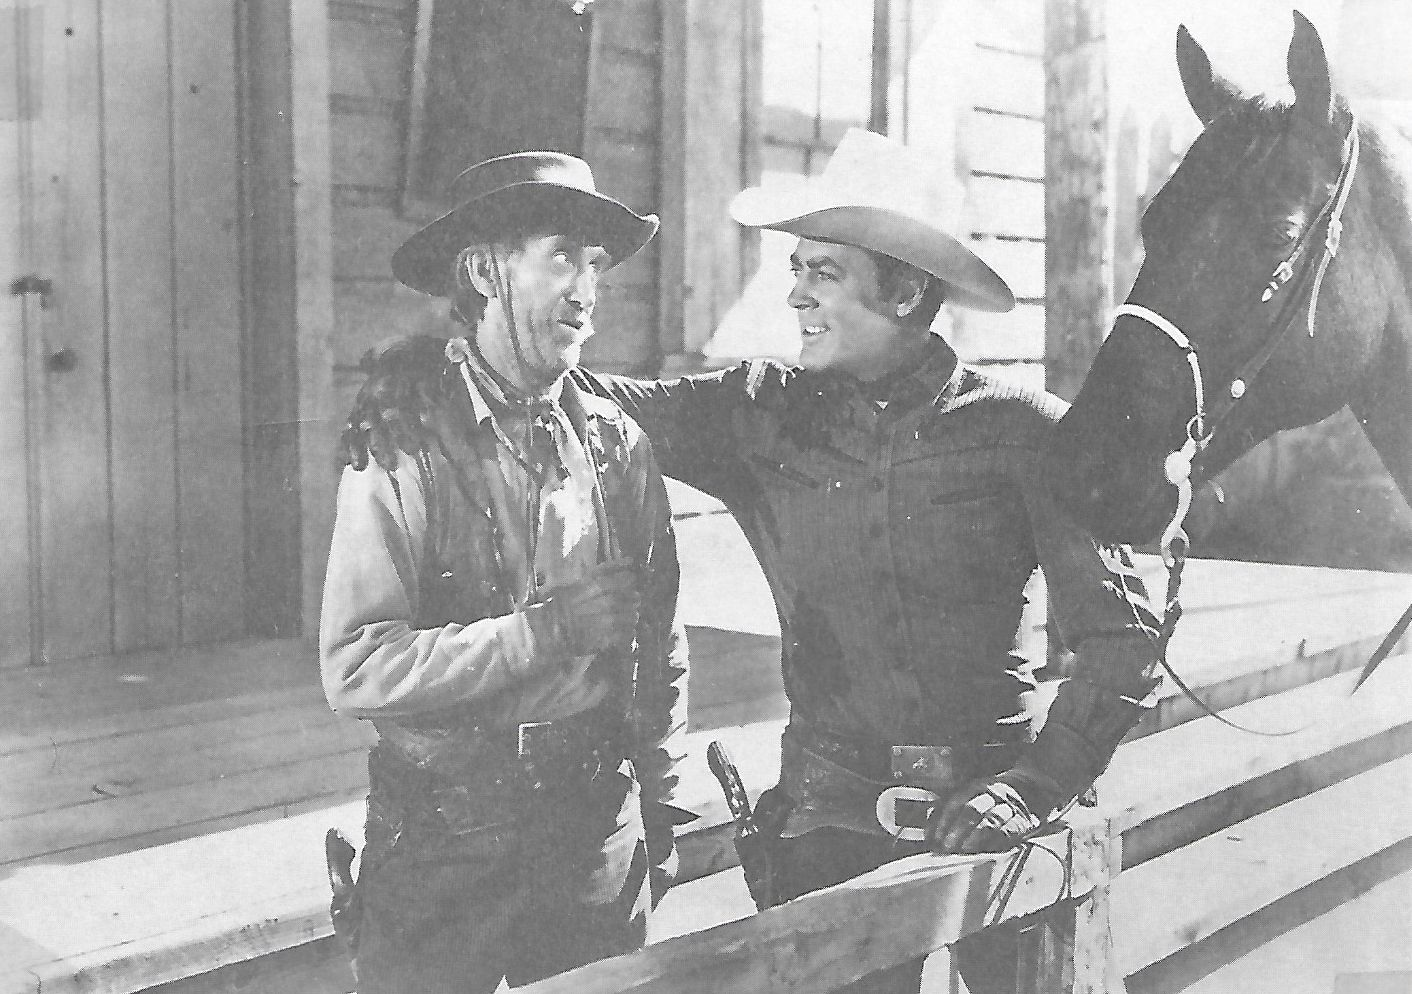 Allan Lane, Eddy Waller, and Black Jack in Sheriff of Wichita (1949)